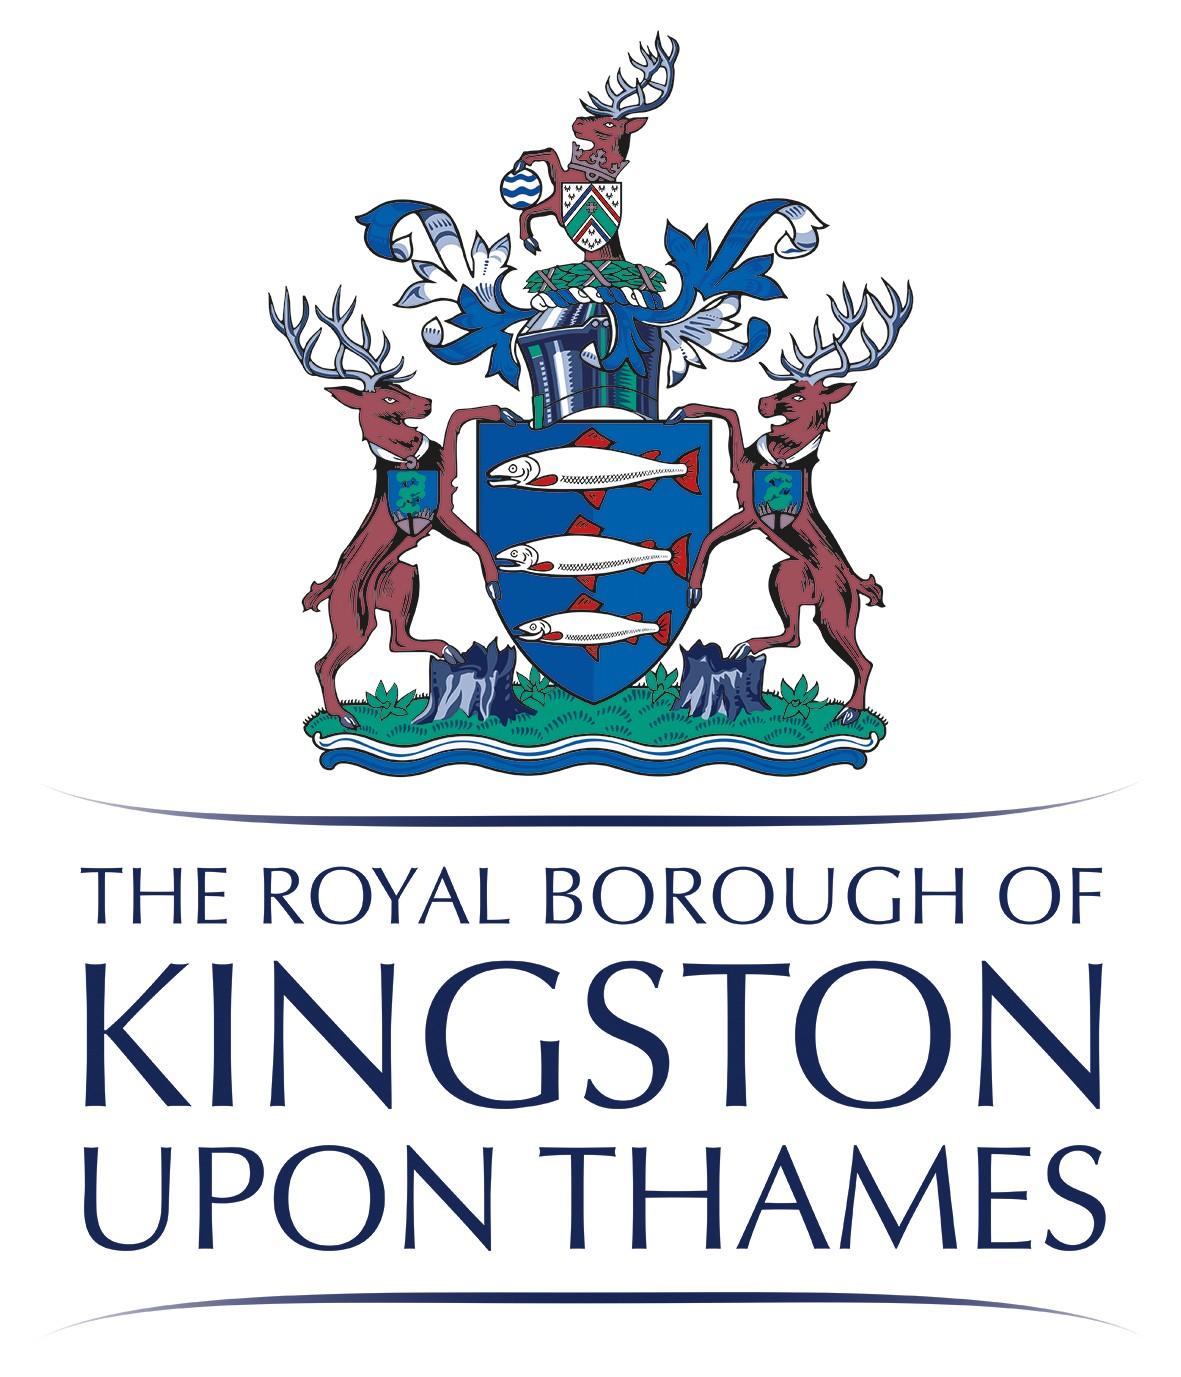 Kingston upon Thames - Wikipedia